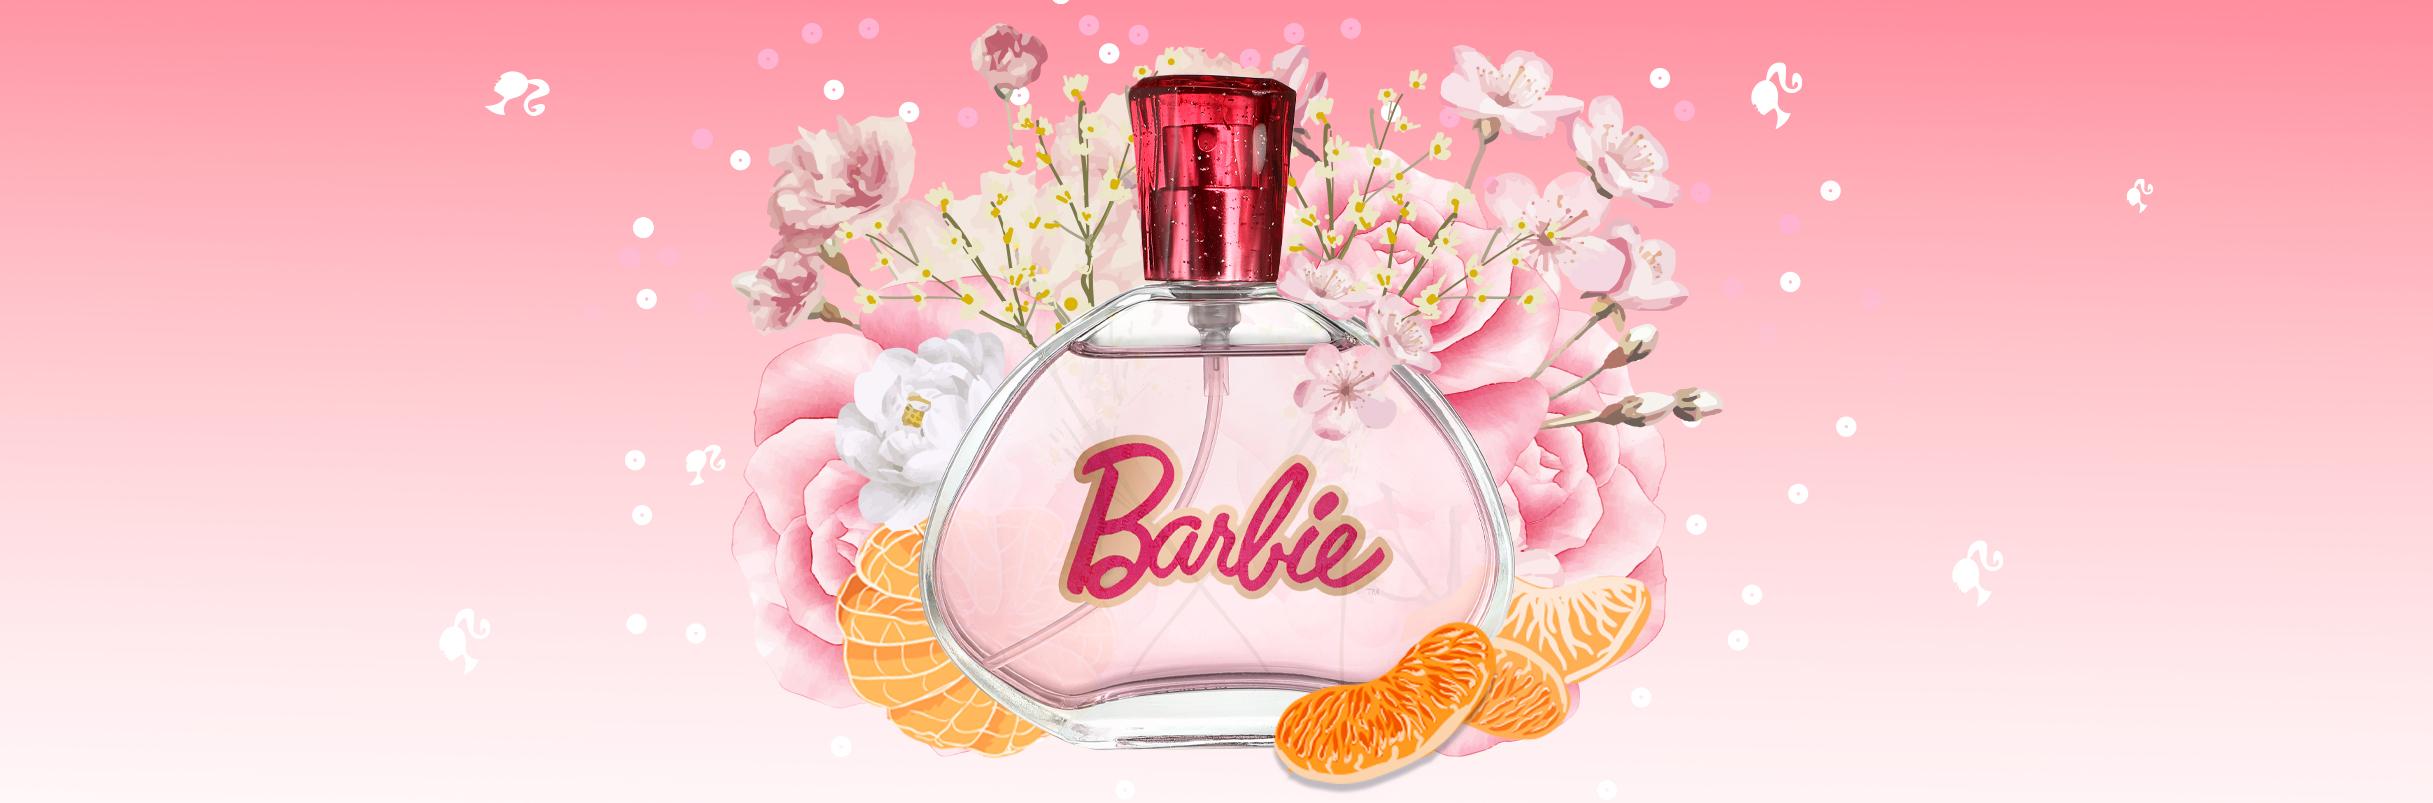 The Barbie fragrances